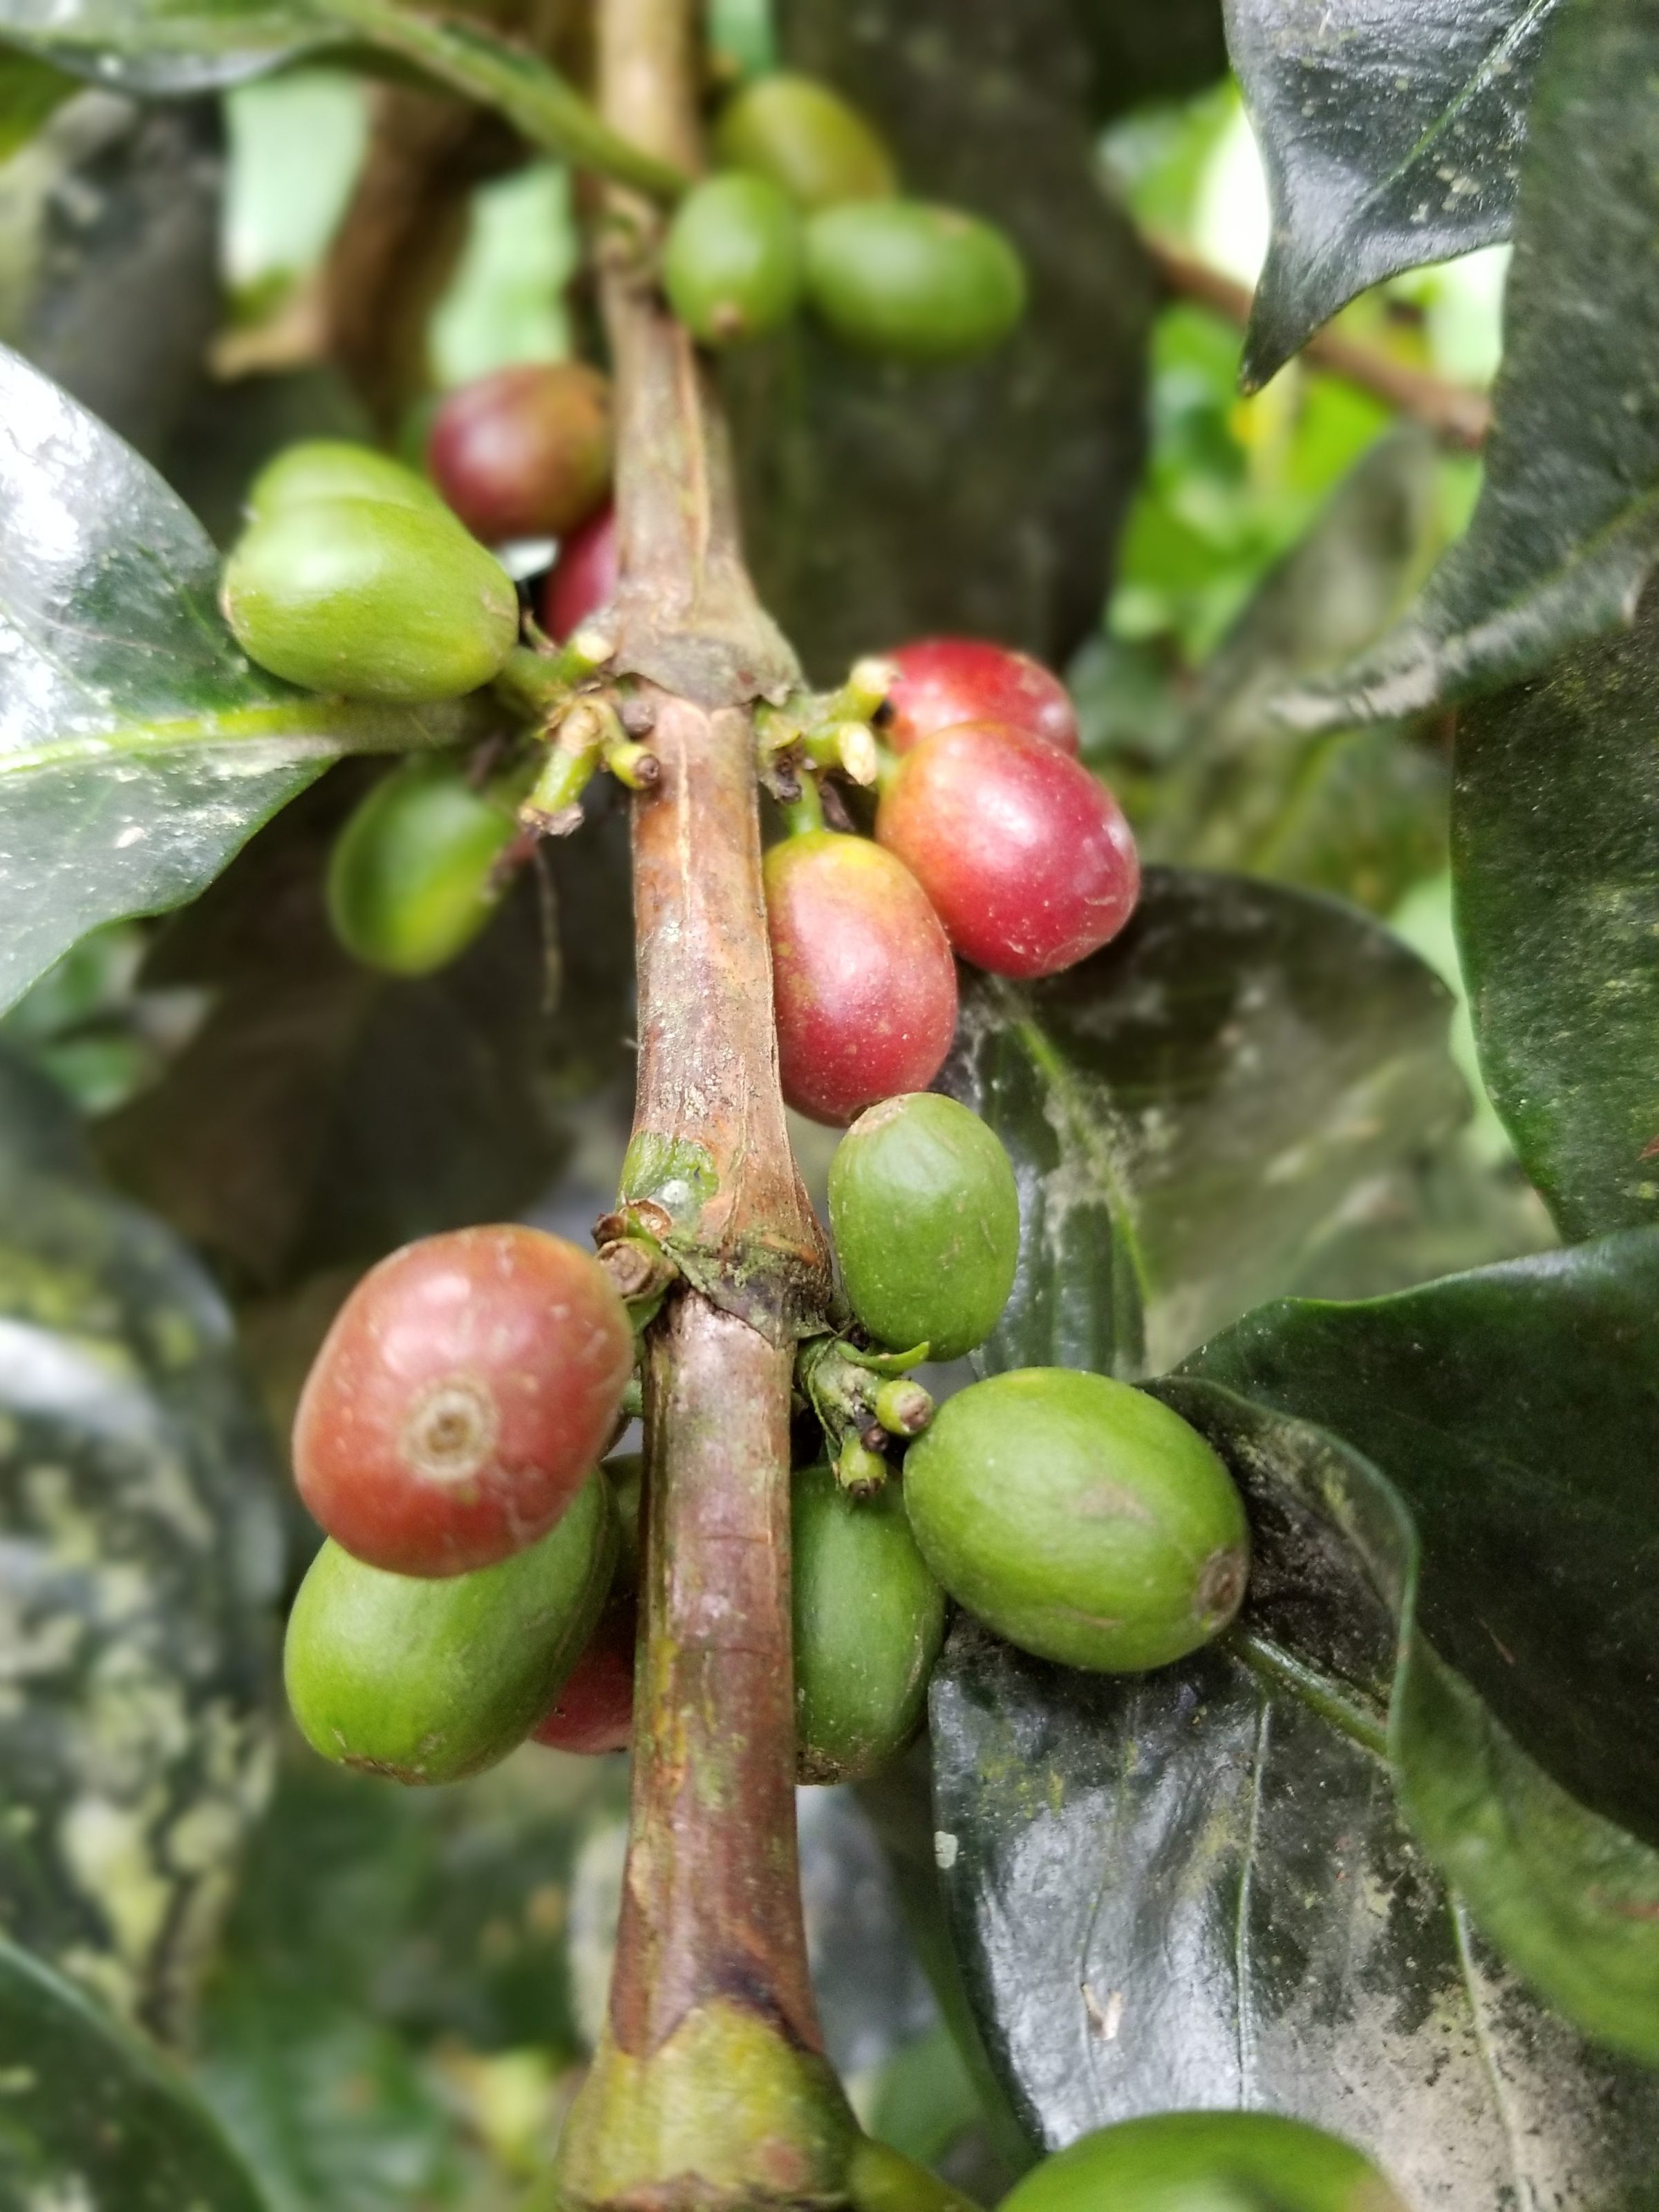 Coffee cherries on the vine